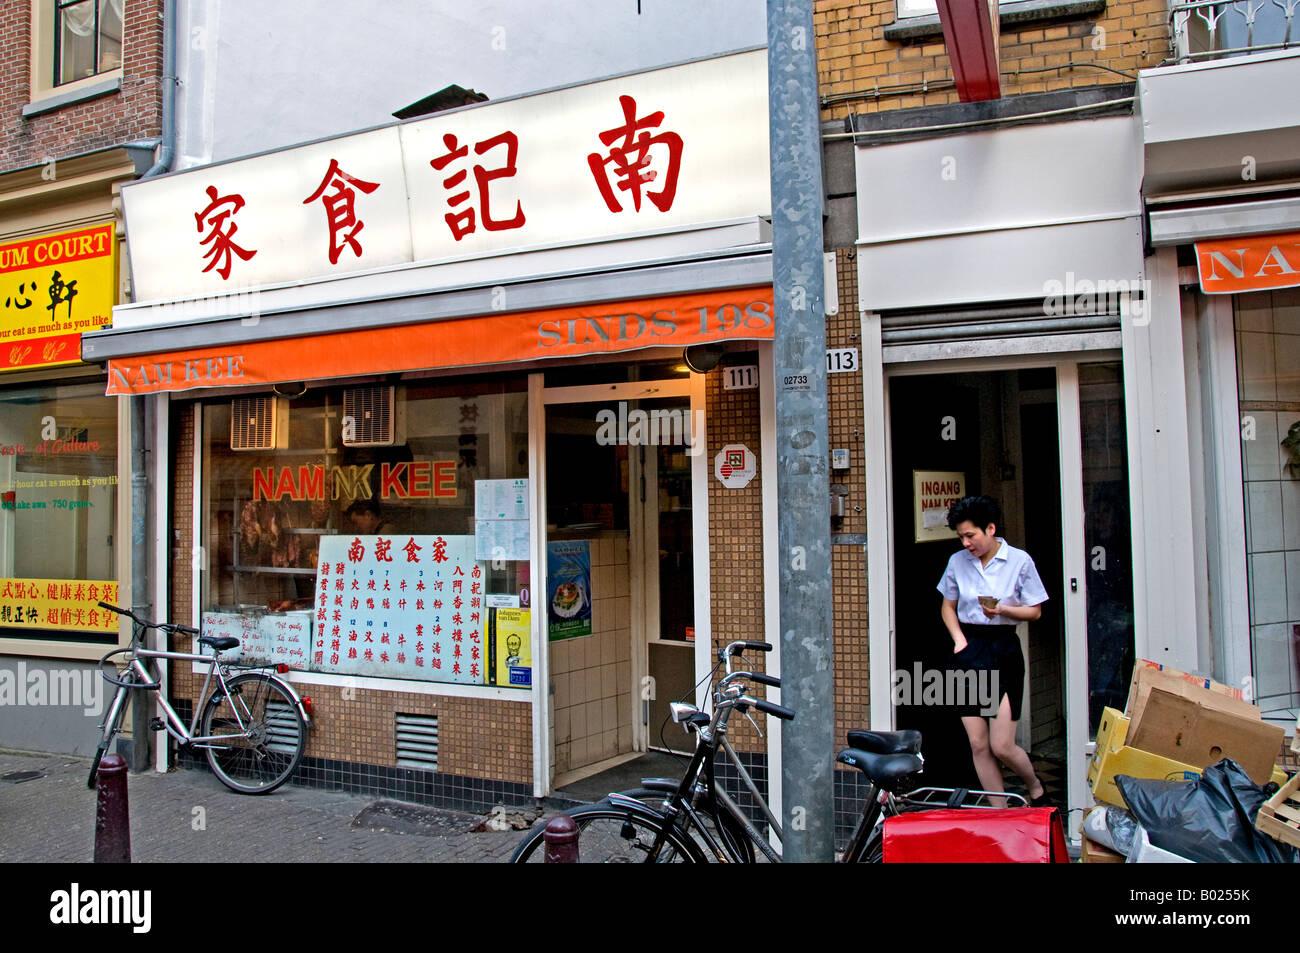 china town amsterdam zeedijk chinese restaurant fat kay stock photo royalty free image. Black Bedroom Furniture Sets. Home Design Ideas